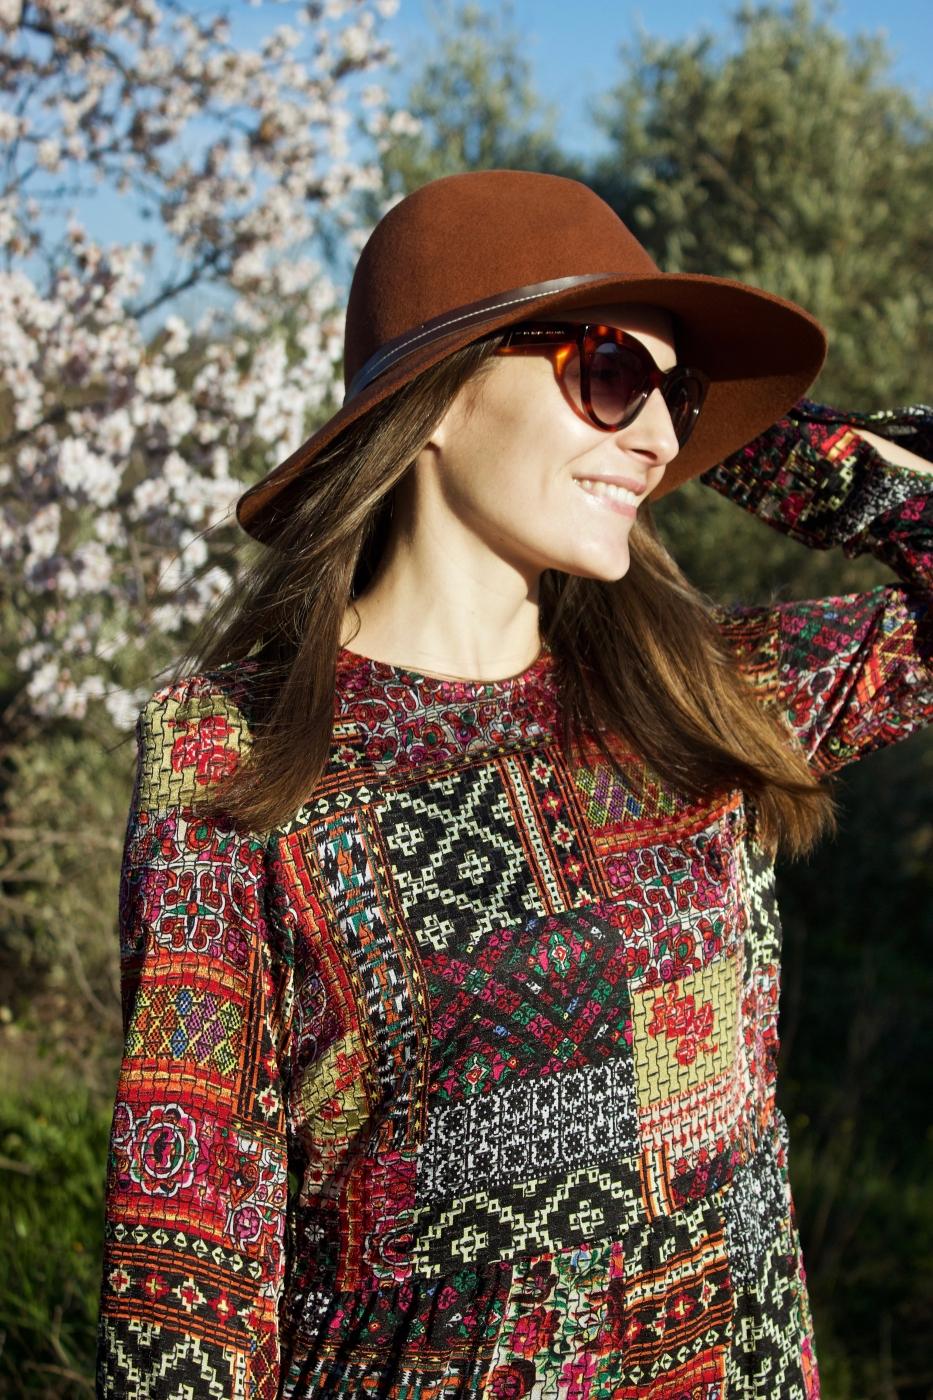 lara-vazquez-madlula-style-streetstyle-look-moda-hat-dress-winter-ootd